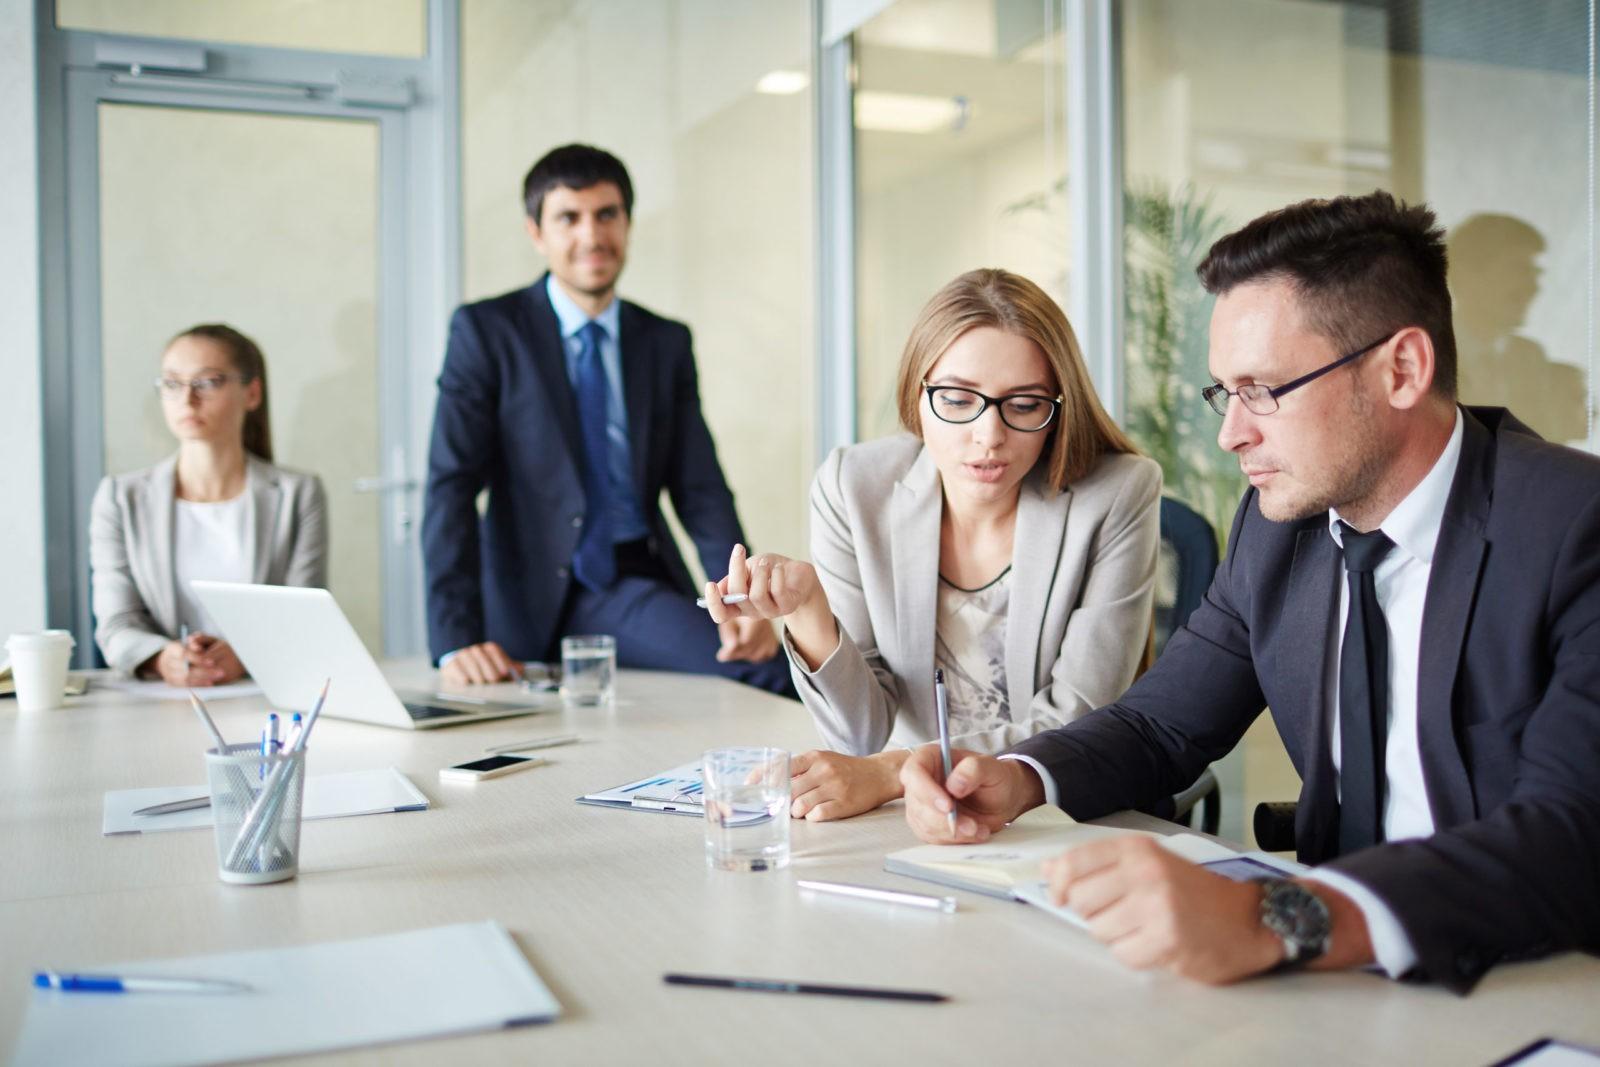 Leasing-Office-Equipment